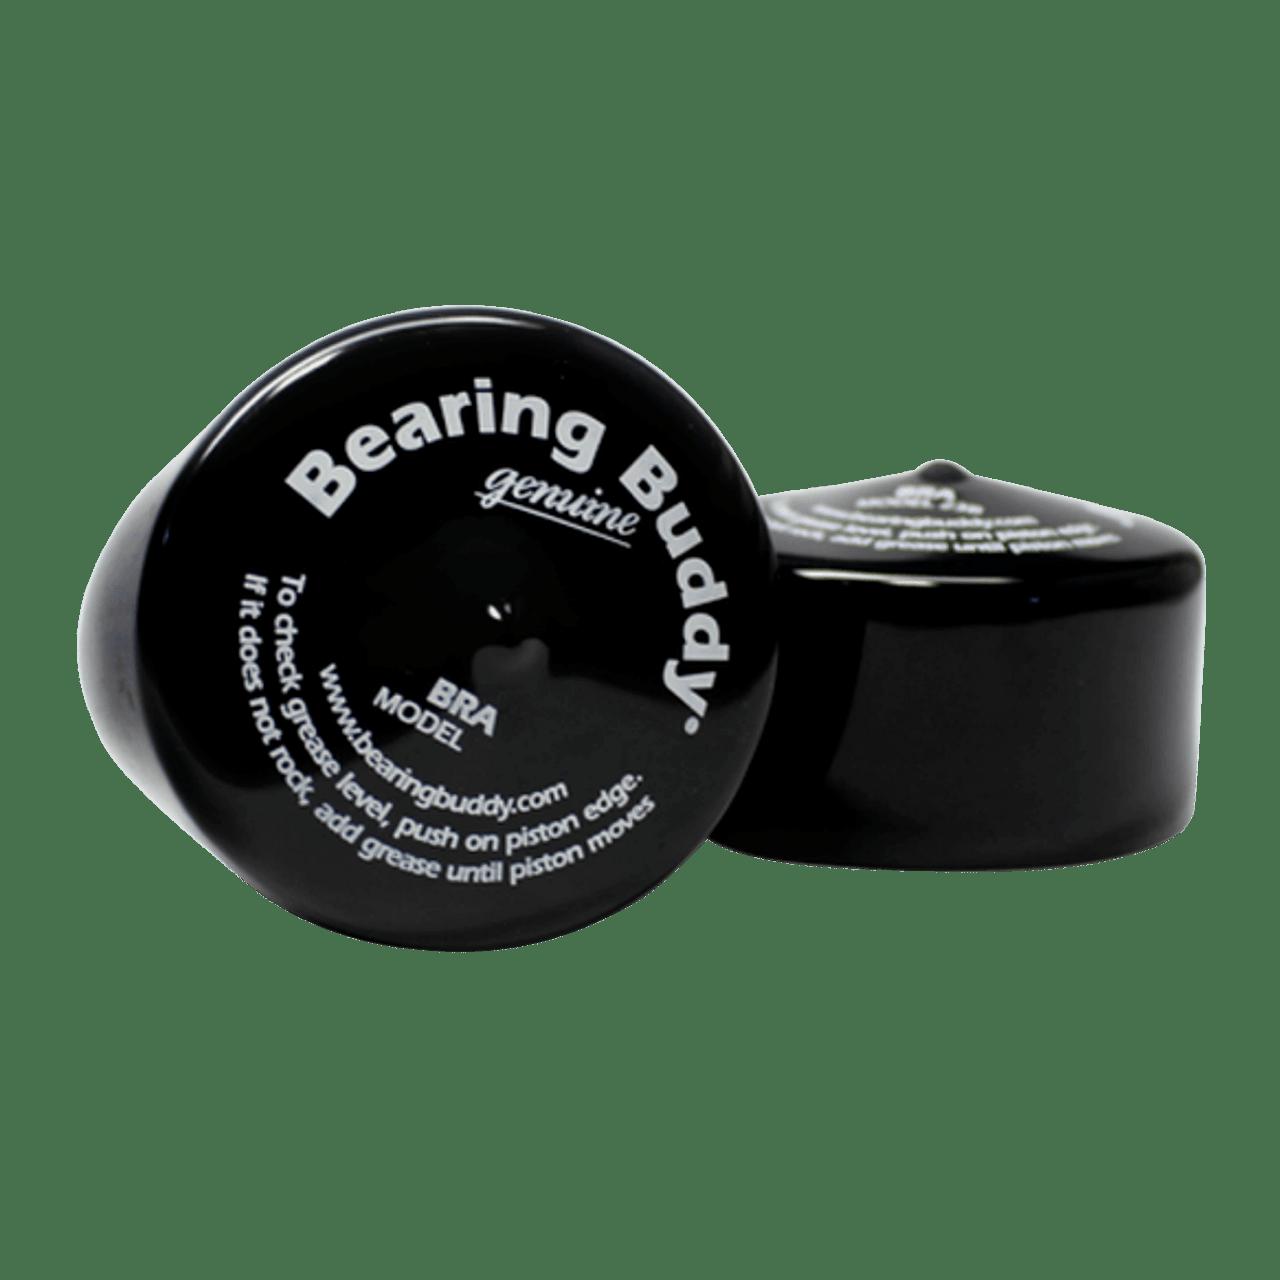 DP-0400 --- Bearing Buddy Bra